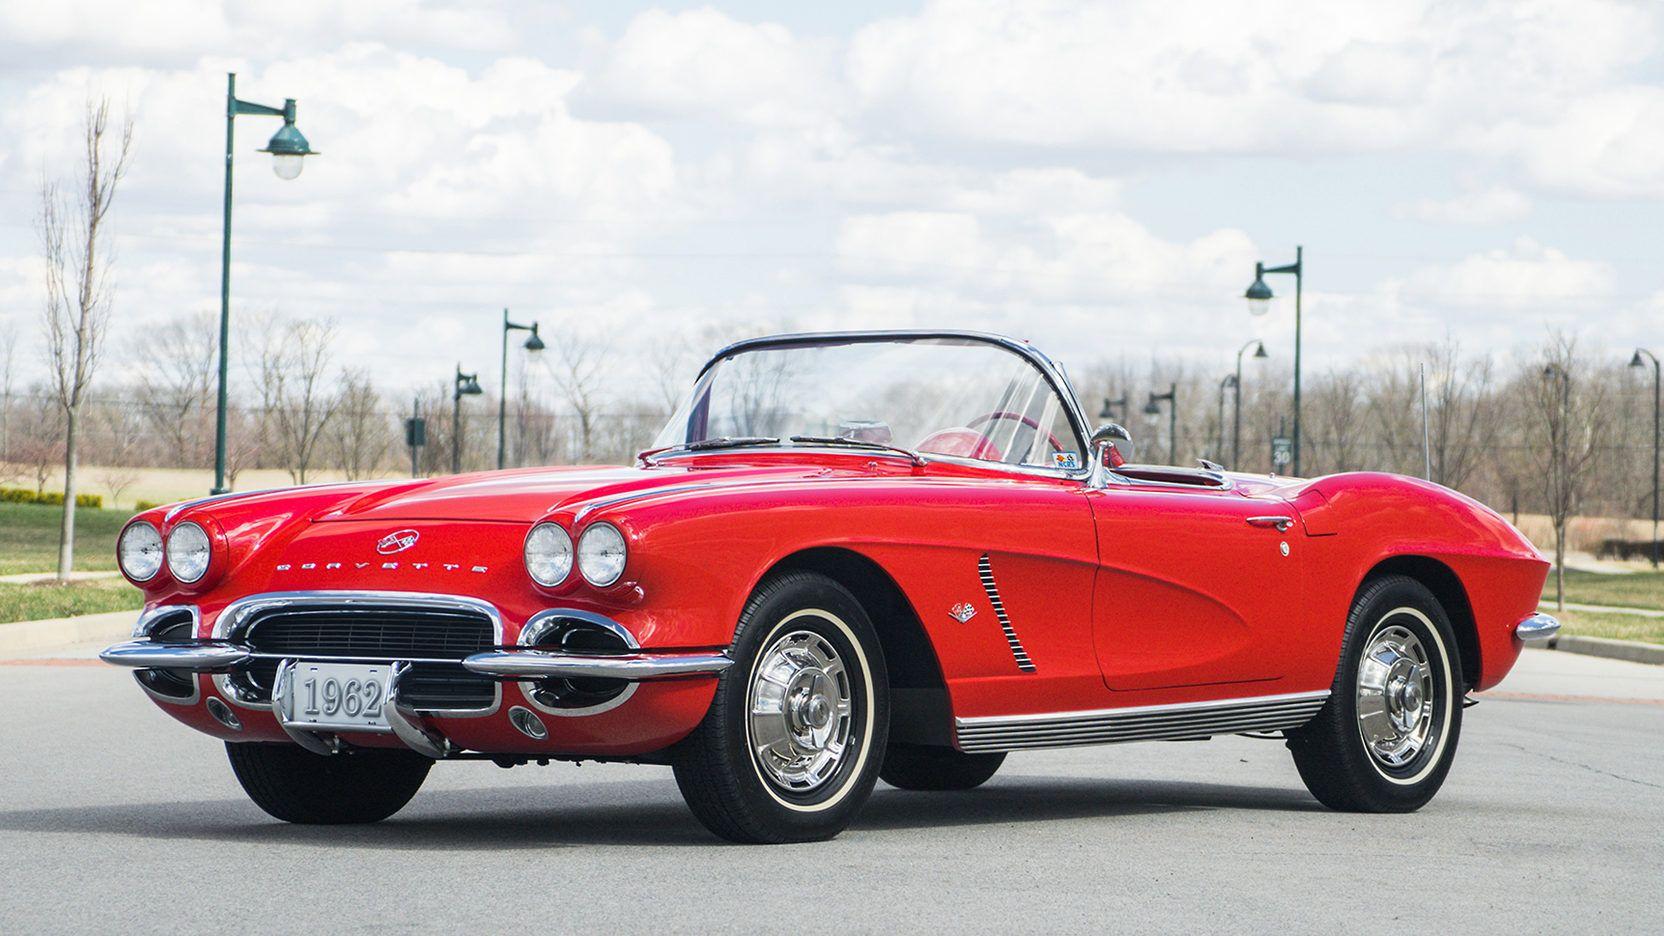 1962 Chevrolet Corvette Convertible Presented As Lot S215 At Indianapolis In Corvette Convertible Chevrolet Corvette Corvette